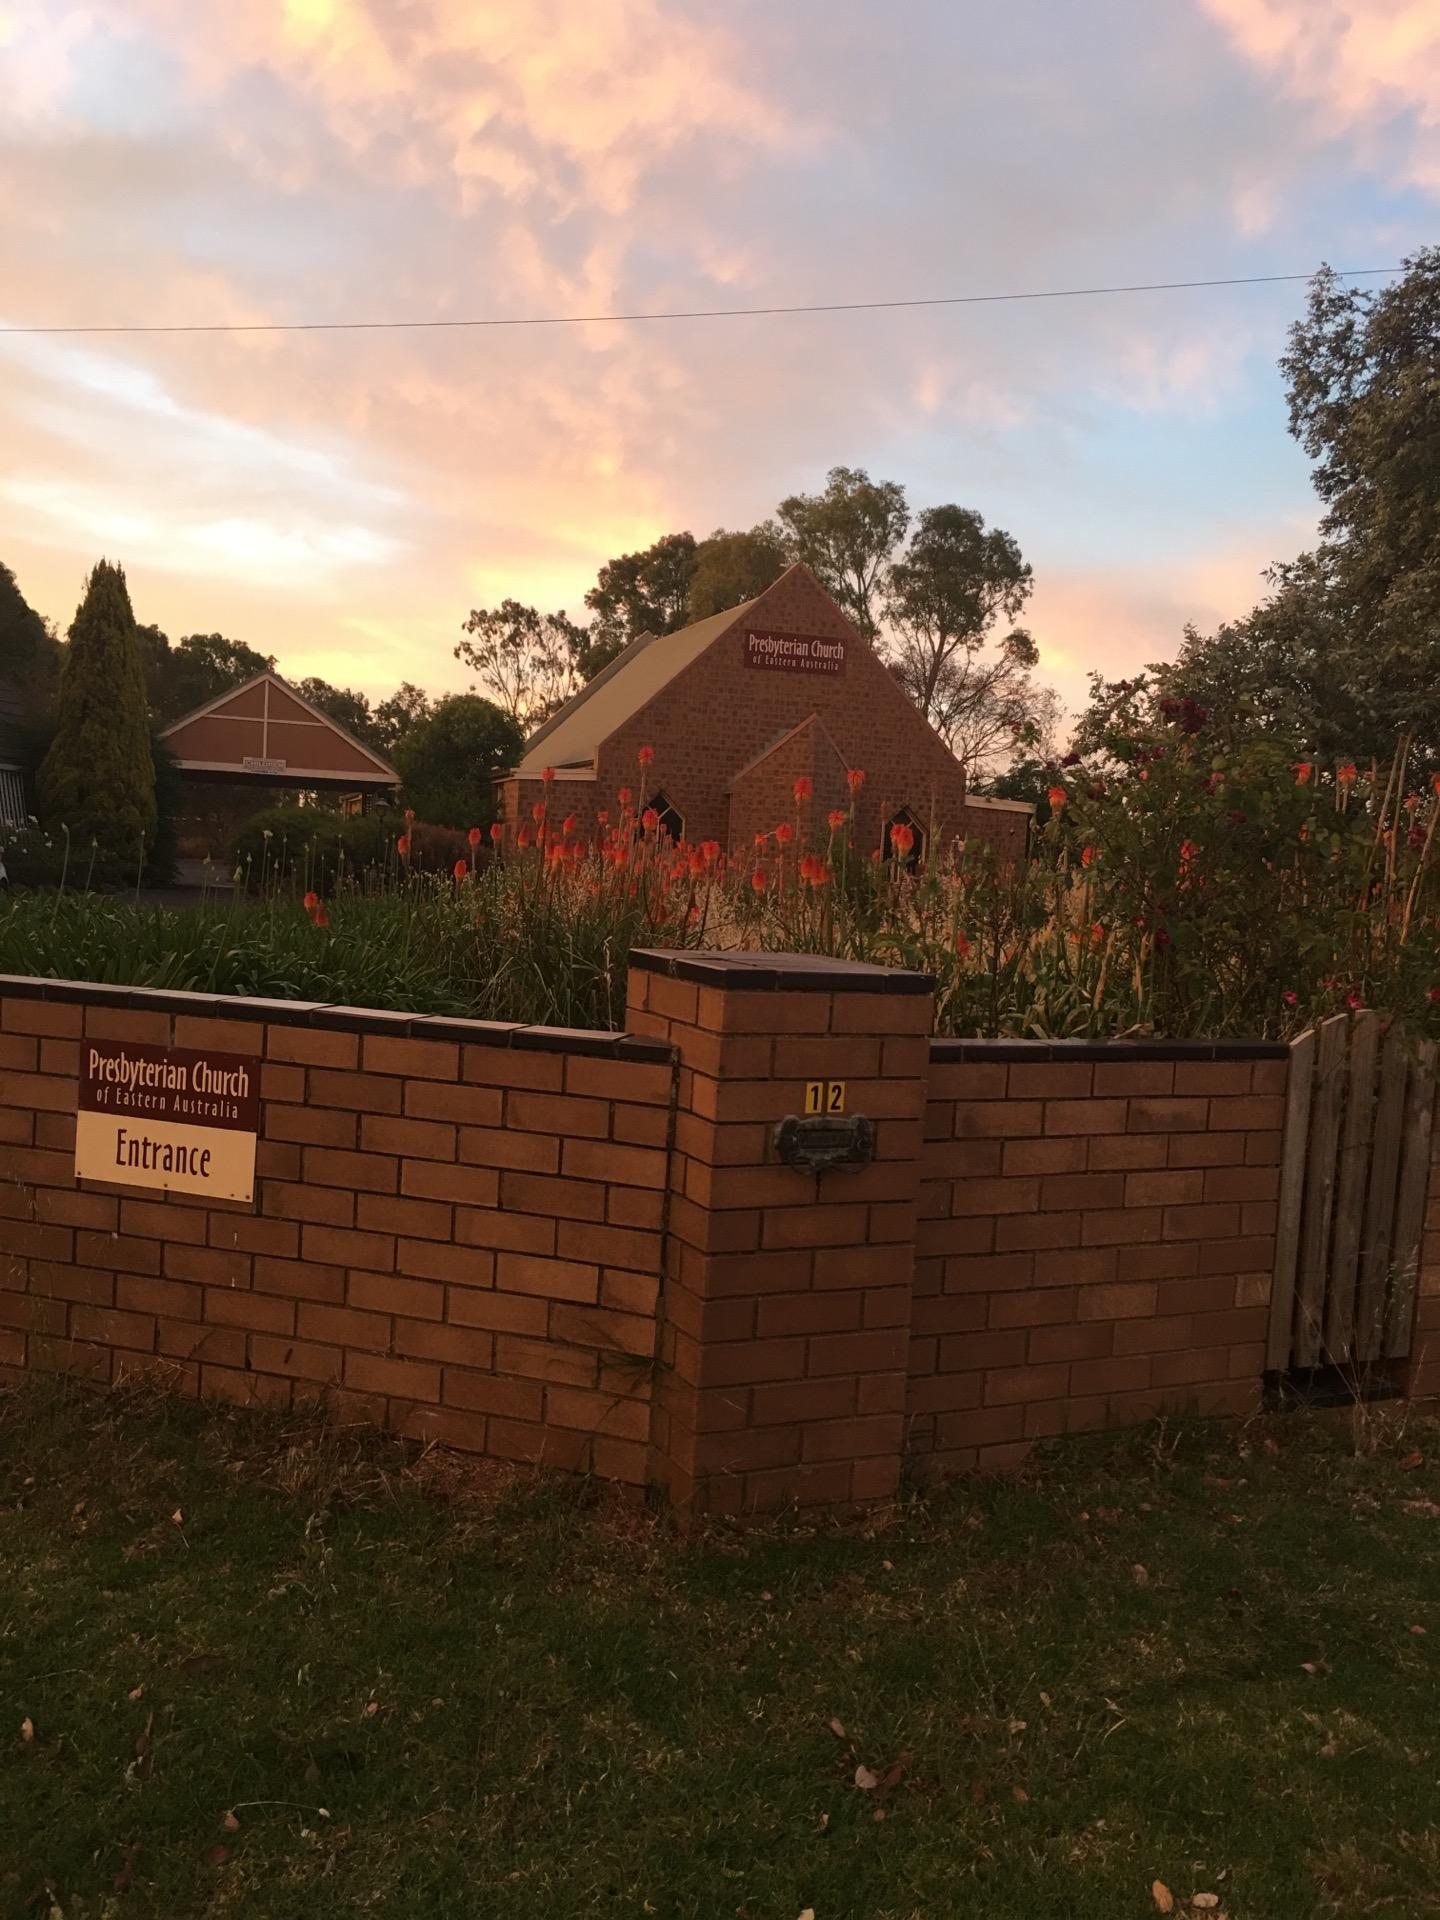 Presbyterian Church Of Eastern Australia | 12 COPPARDS Road, Newcomb, Victoria 3219 | +61 3 5248 4110